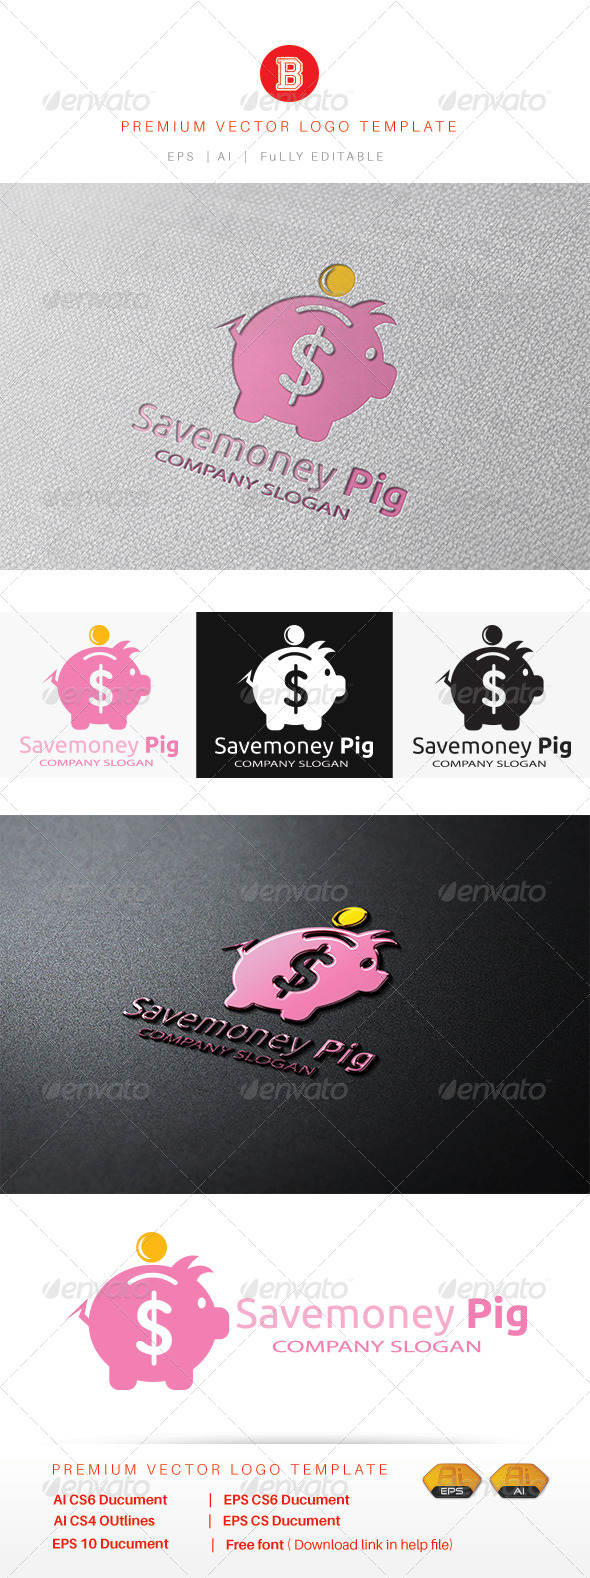 GraphicRiver Savemoney Pig 8522558